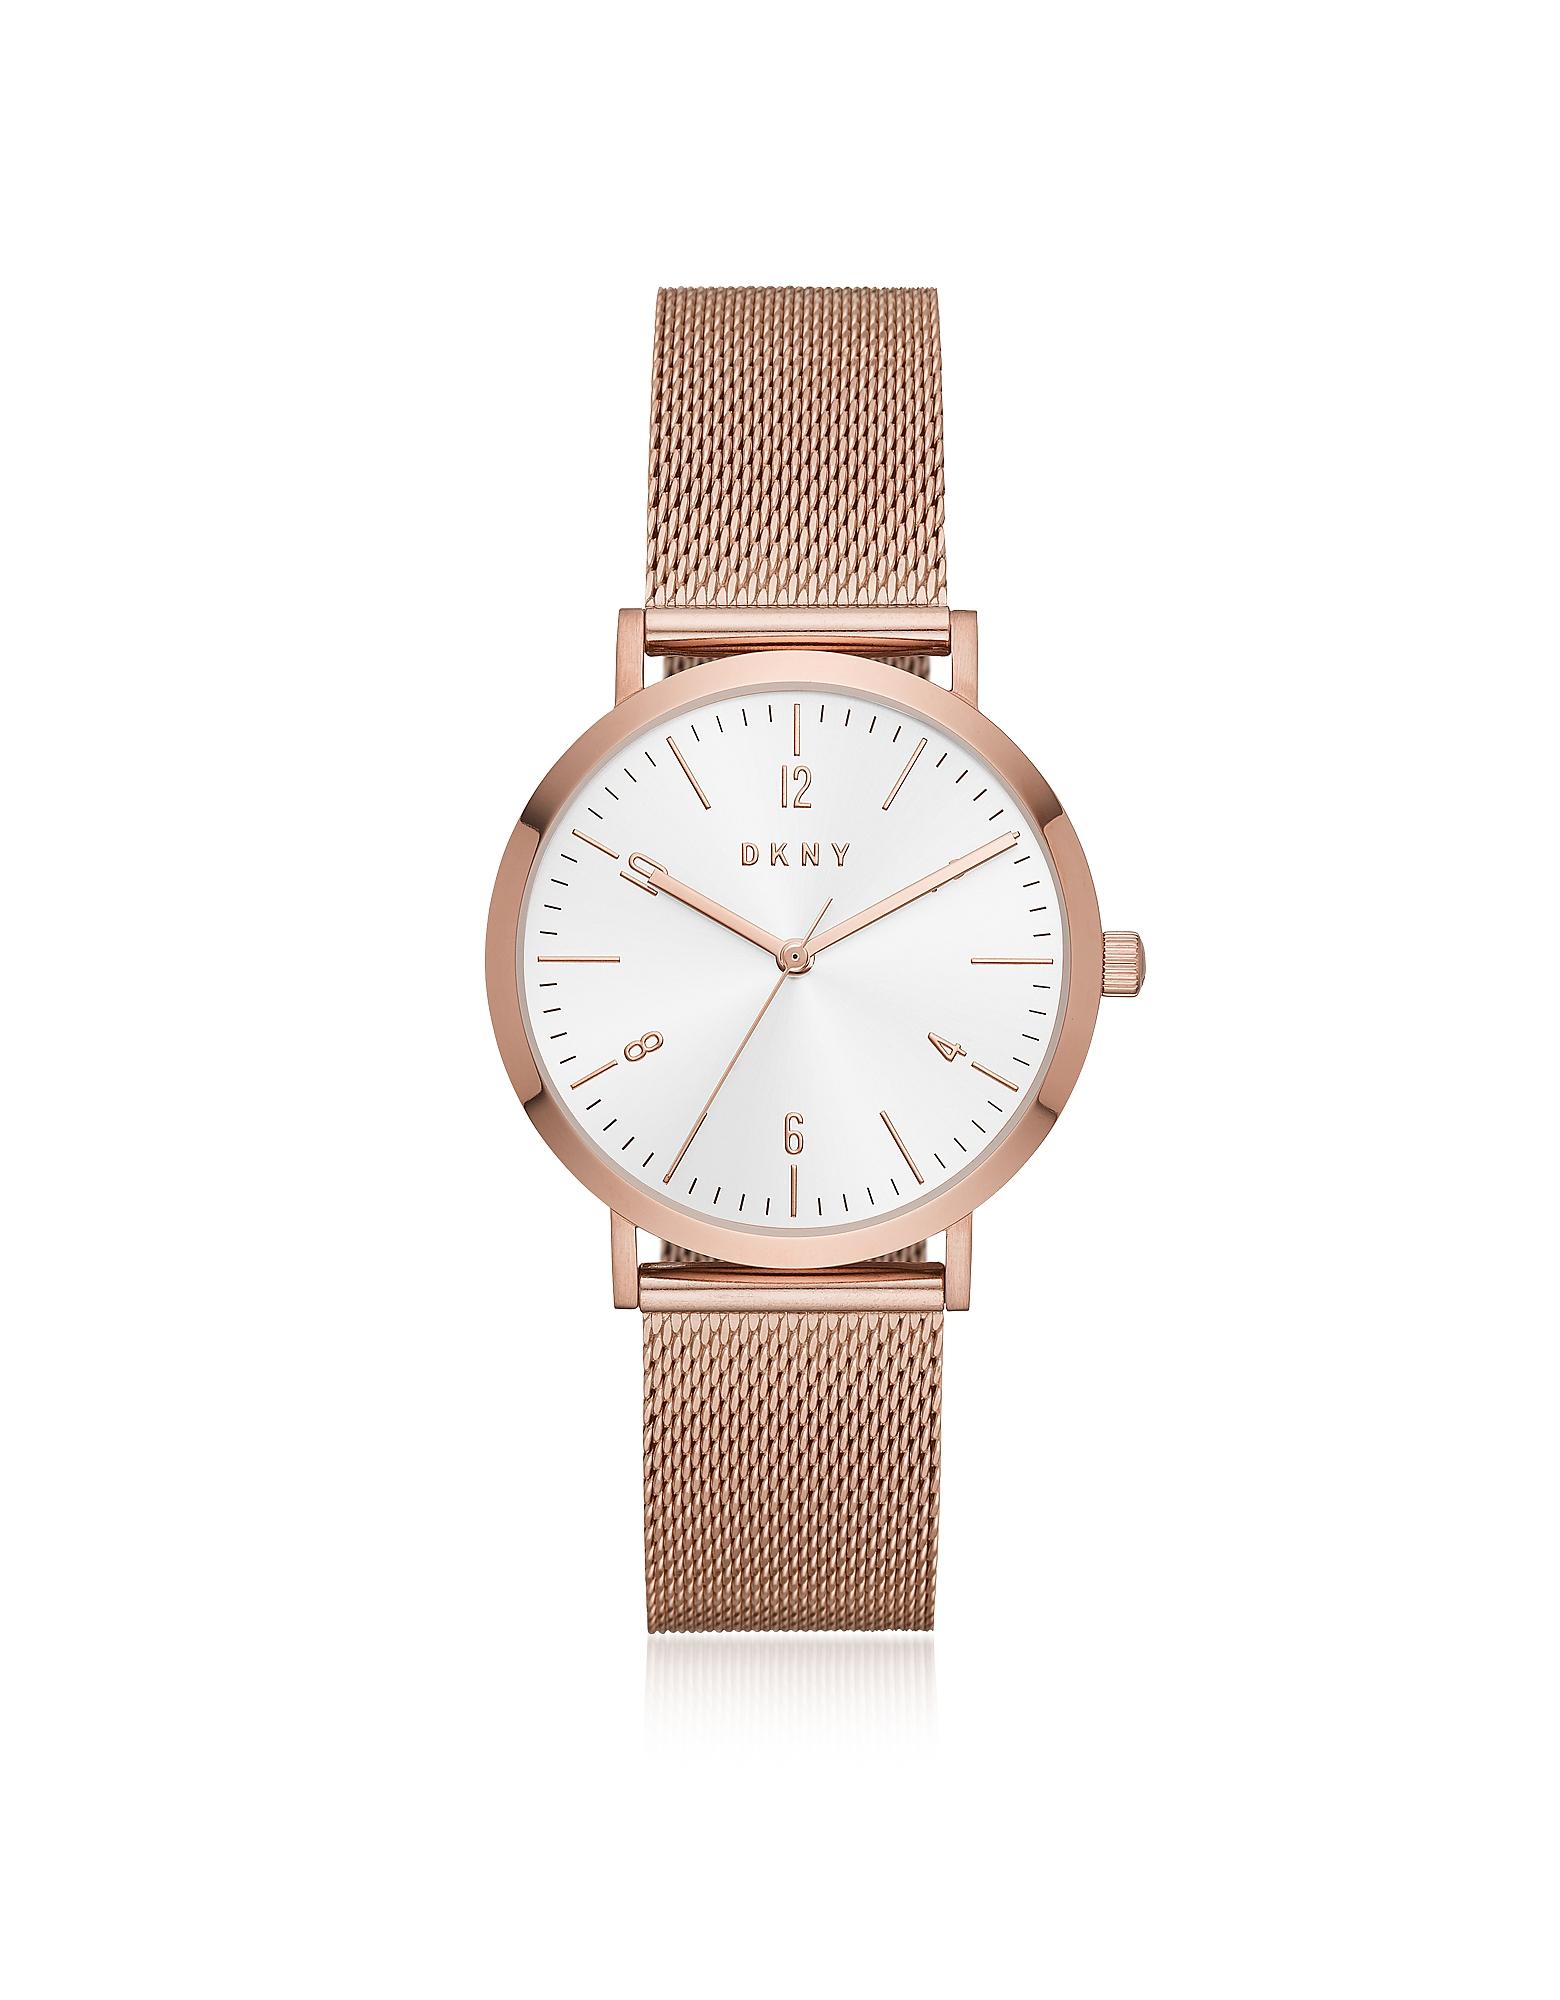 DKNY Women's Watches, Minetta Rose Gold Tone Stainless Steel Mesh Women's Watch